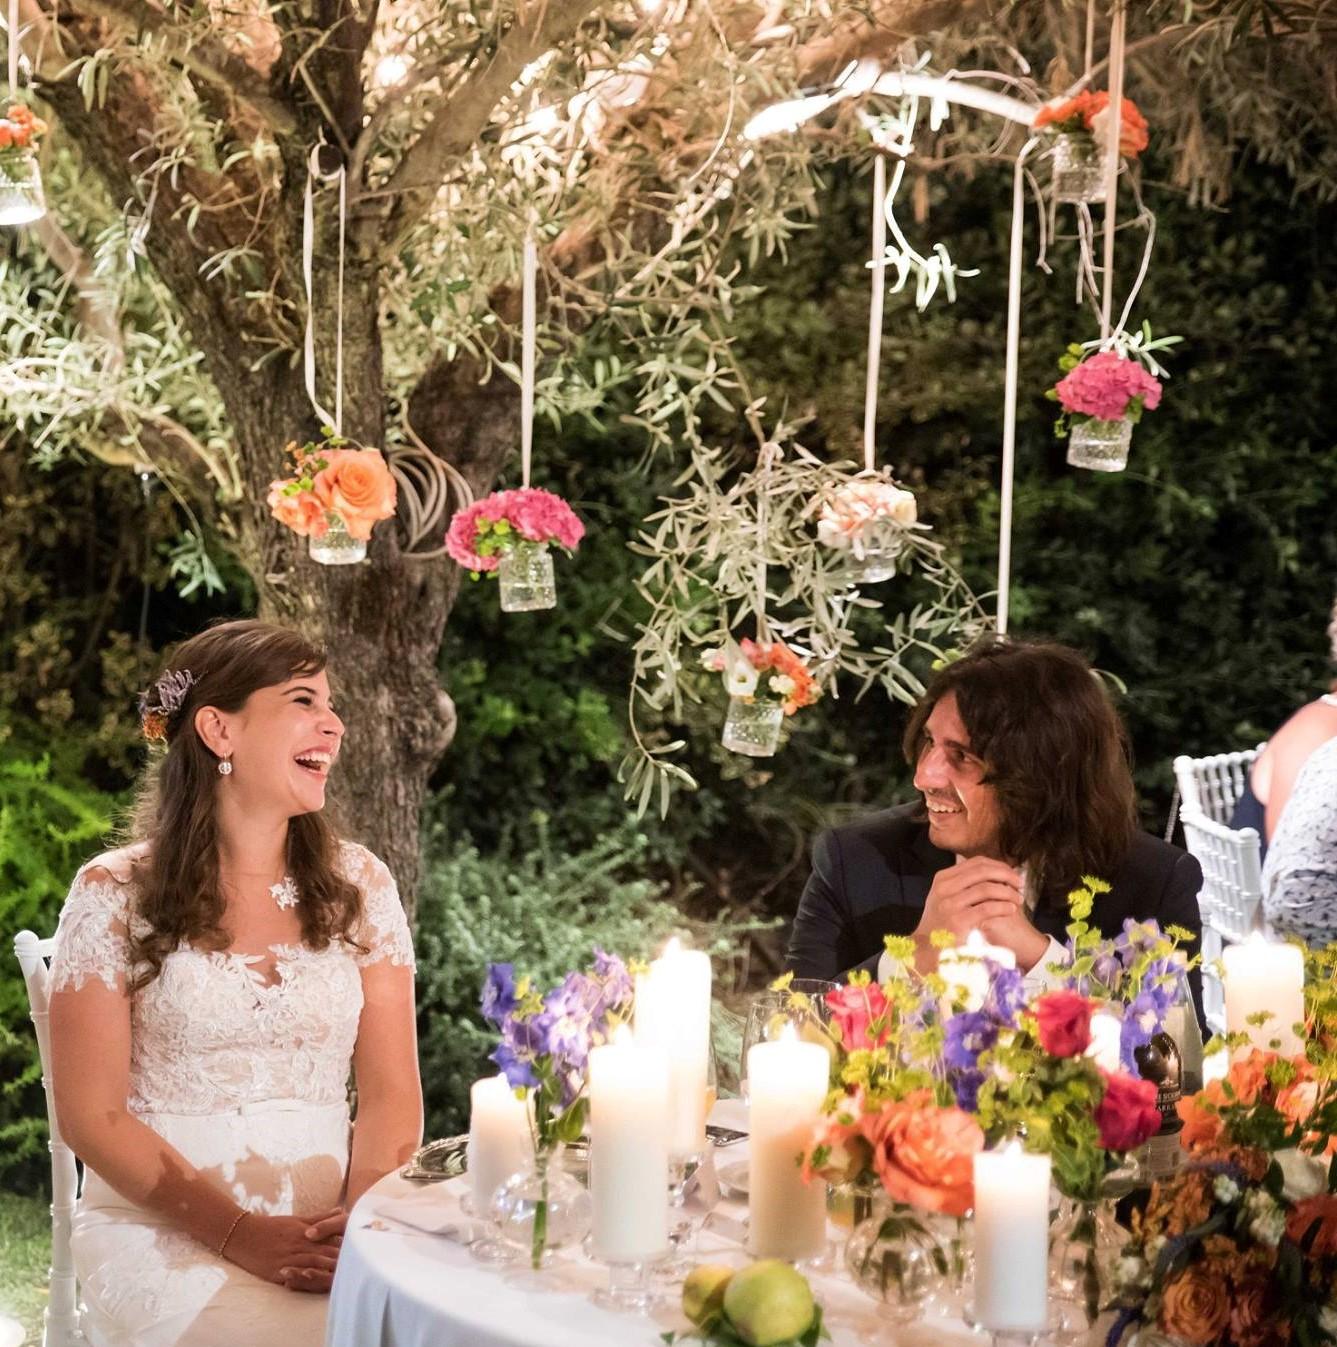 Bruidspaar aan dinertafel in prachtig gestylde tuin